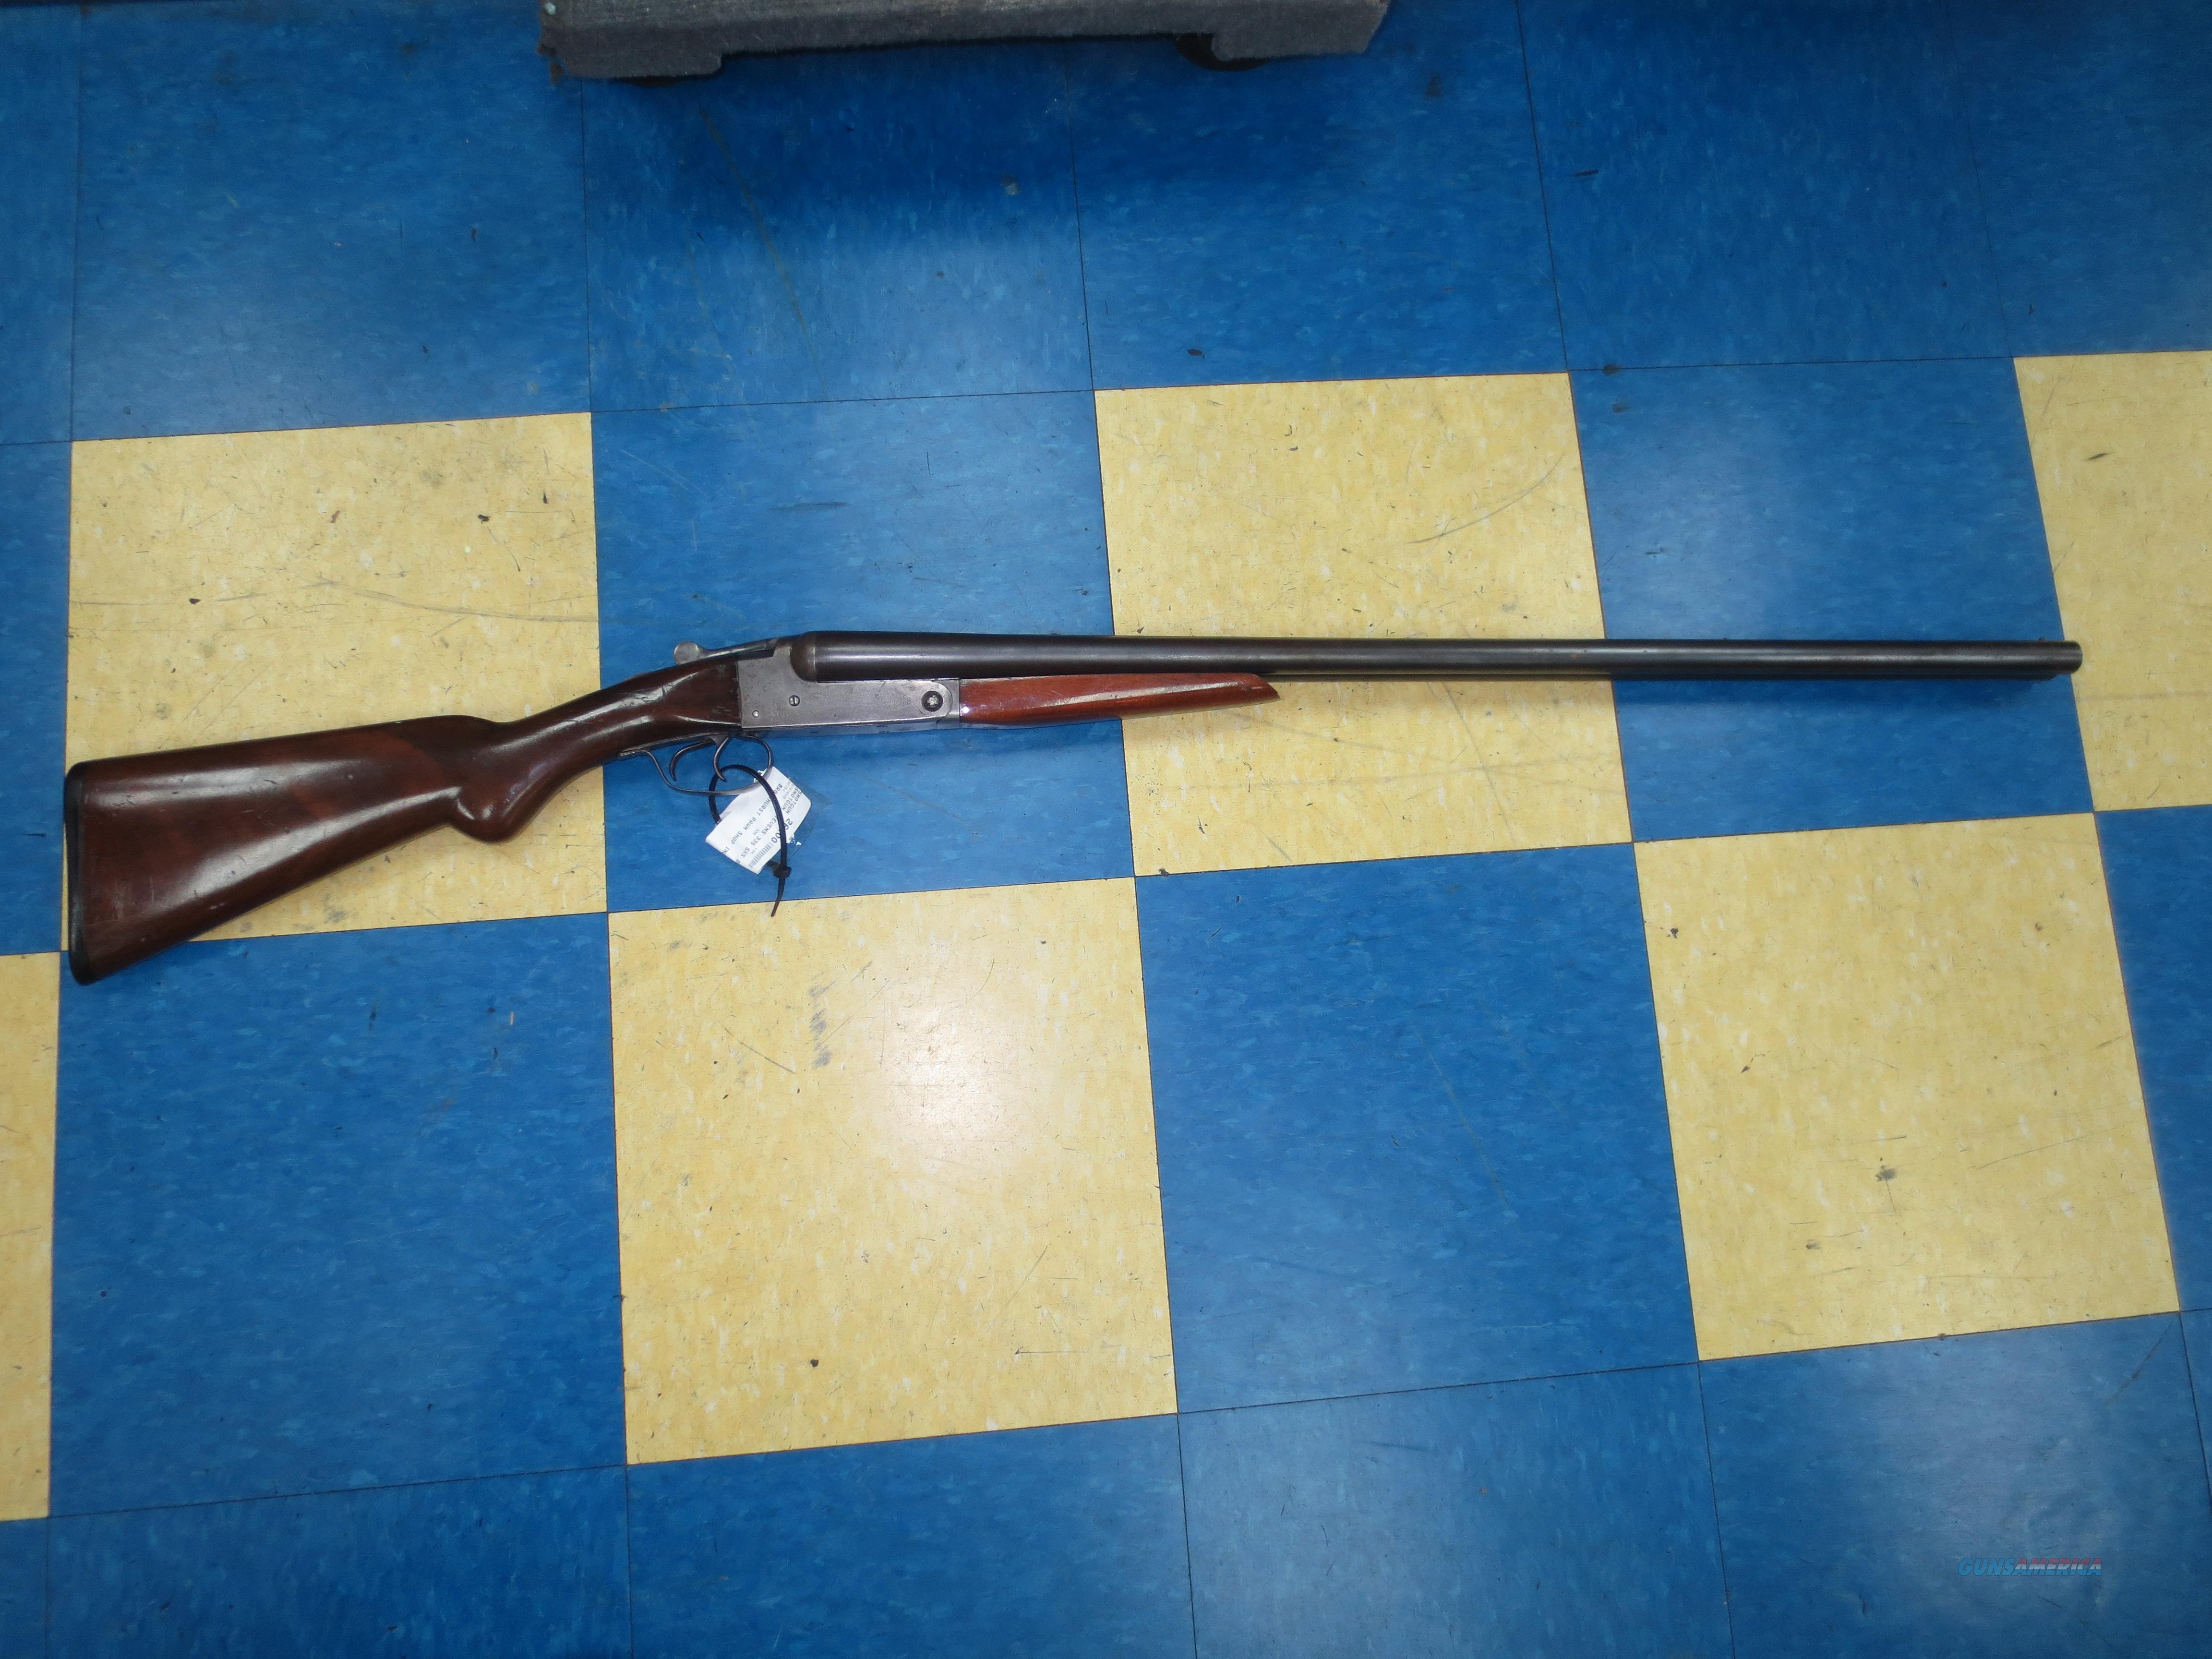 Stevens model 335 SxS 12 gauge Dual trigger  Guns > Shotguns > Stevens Shotguns